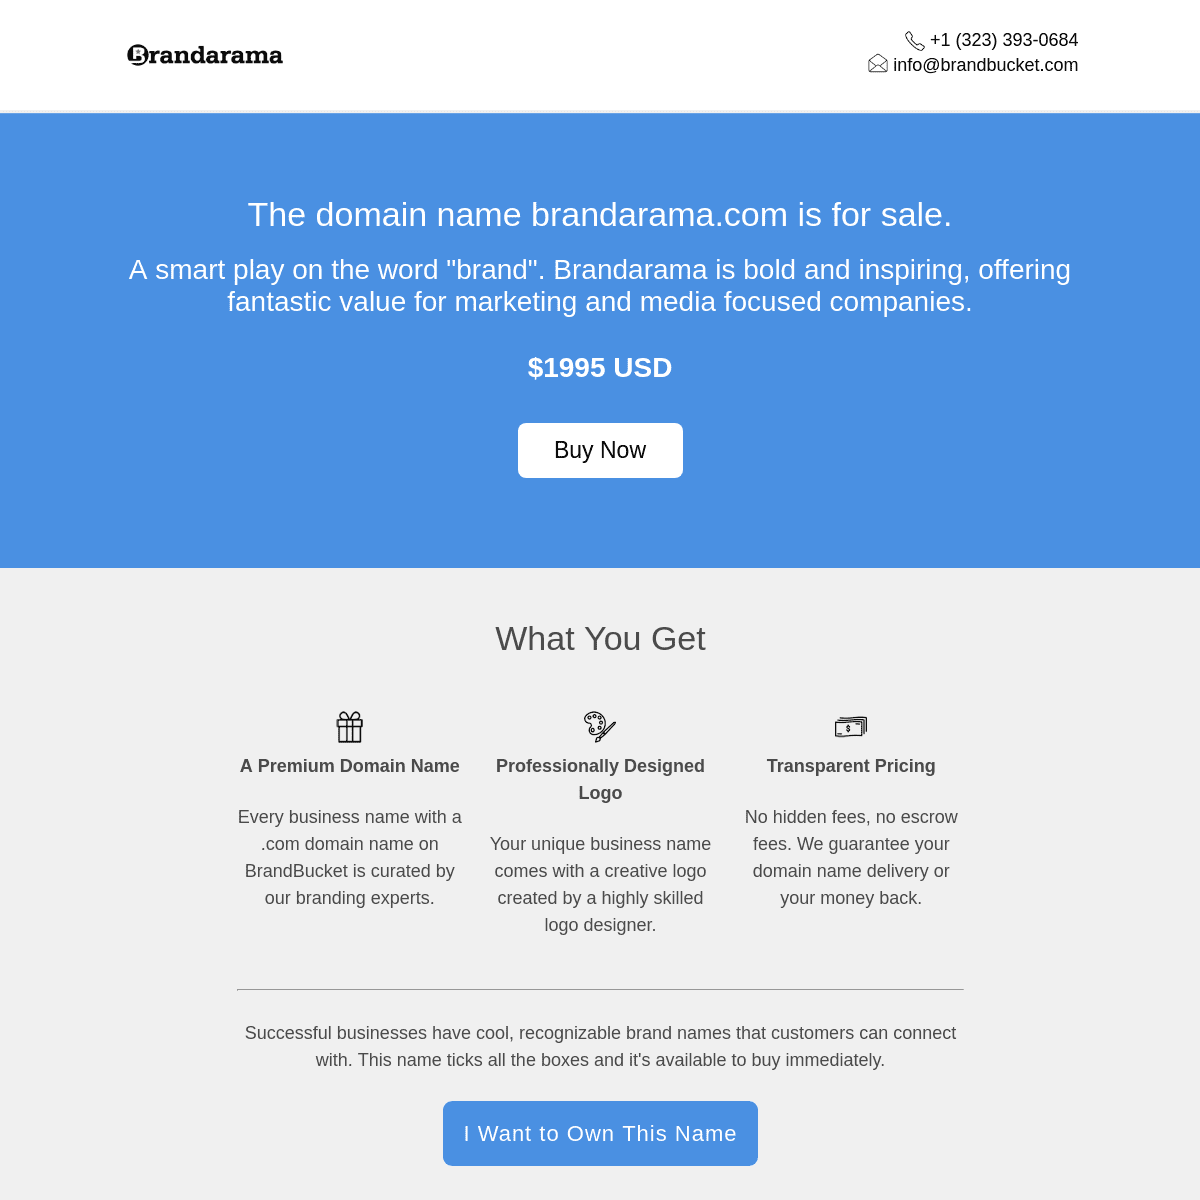 The domain name brandarama.com is for sale